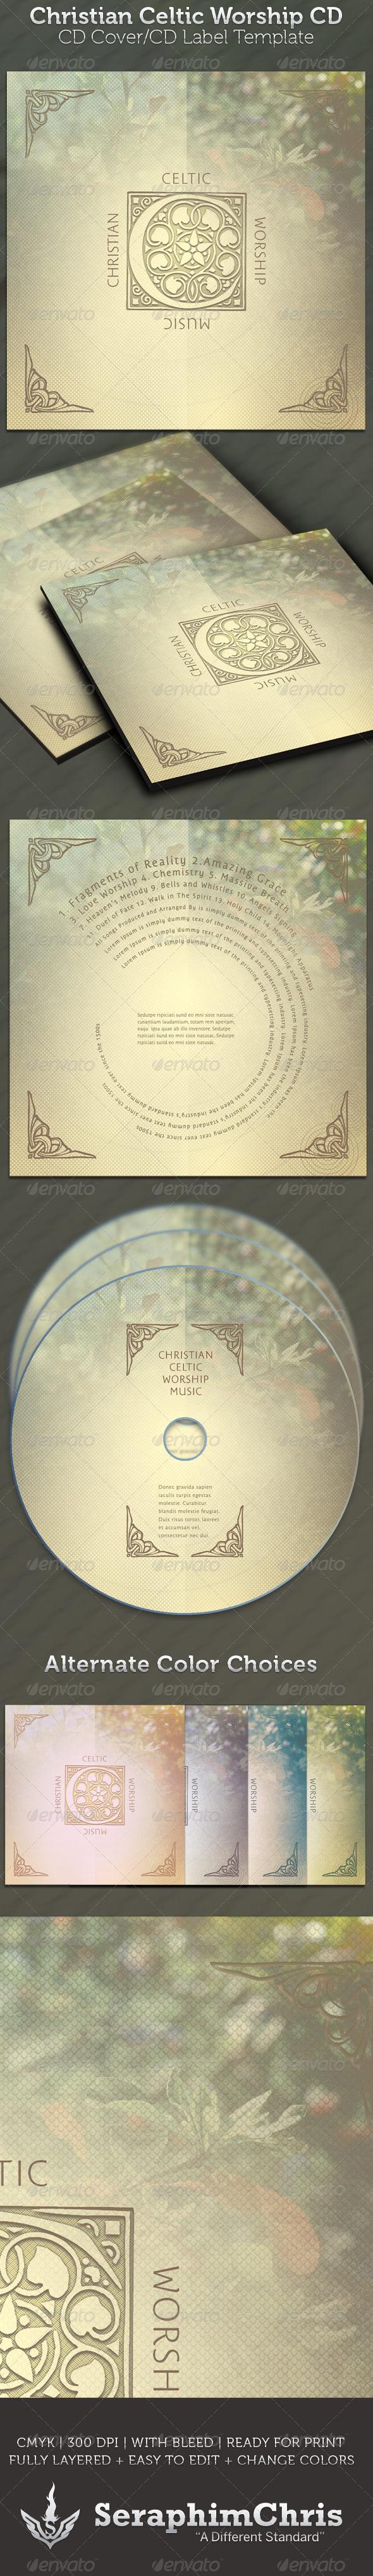 GraphicRiver Celtic Christian Worship CD 2304896